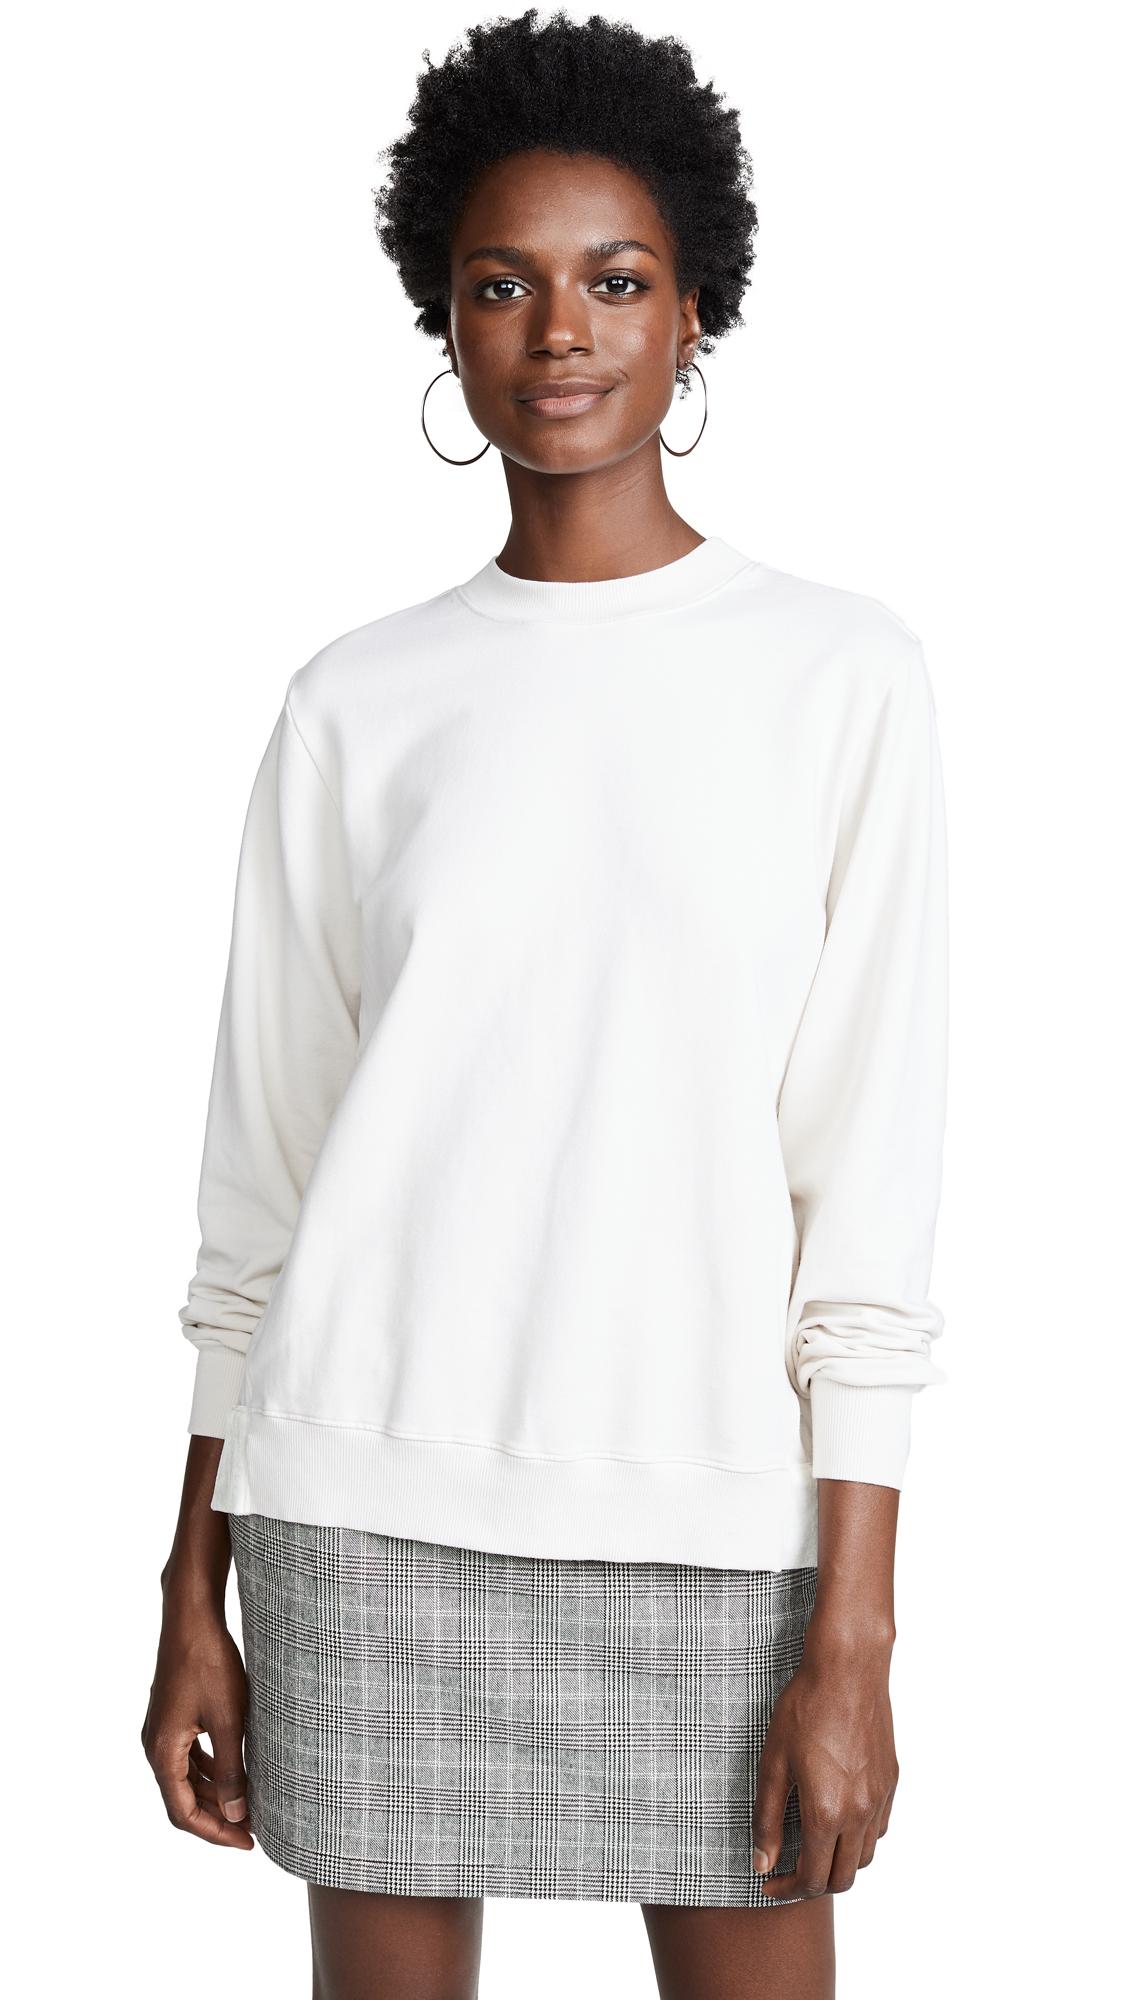 Clu Lace Trimmed Sweatshirt In Vanilla